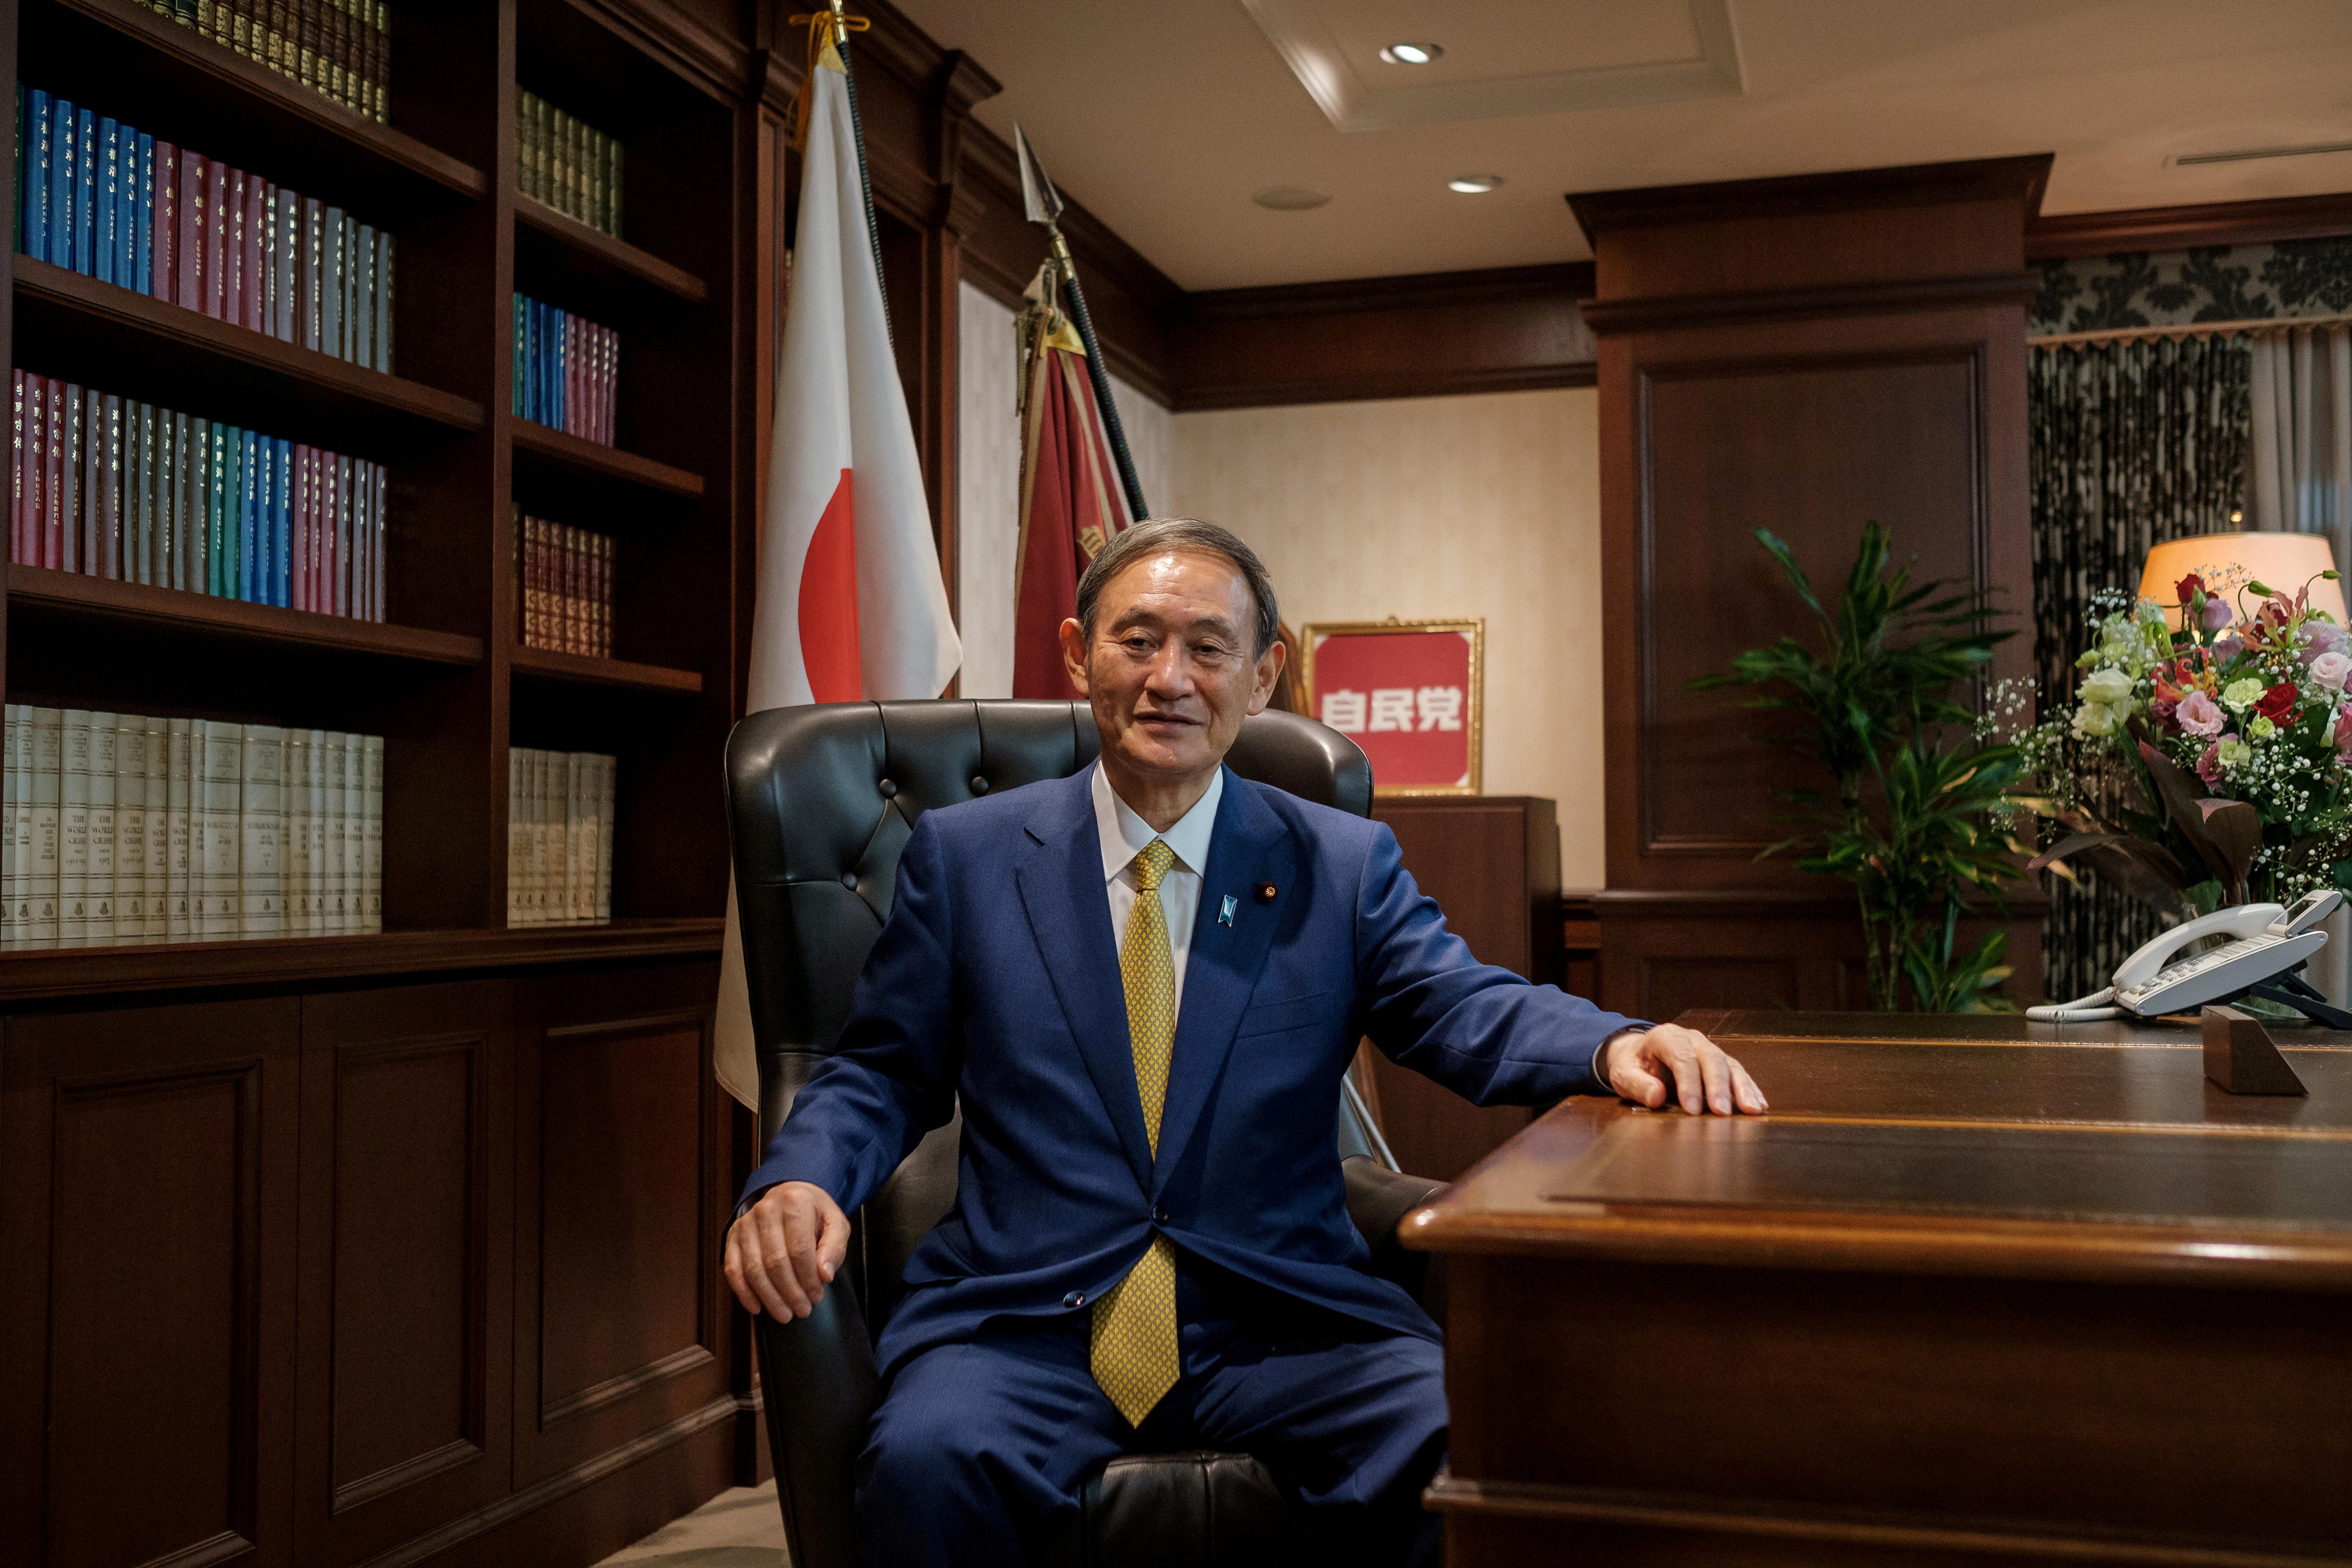 S. Korea voices 'deep regrets' over Suga's offering to Yasukuni war shrine